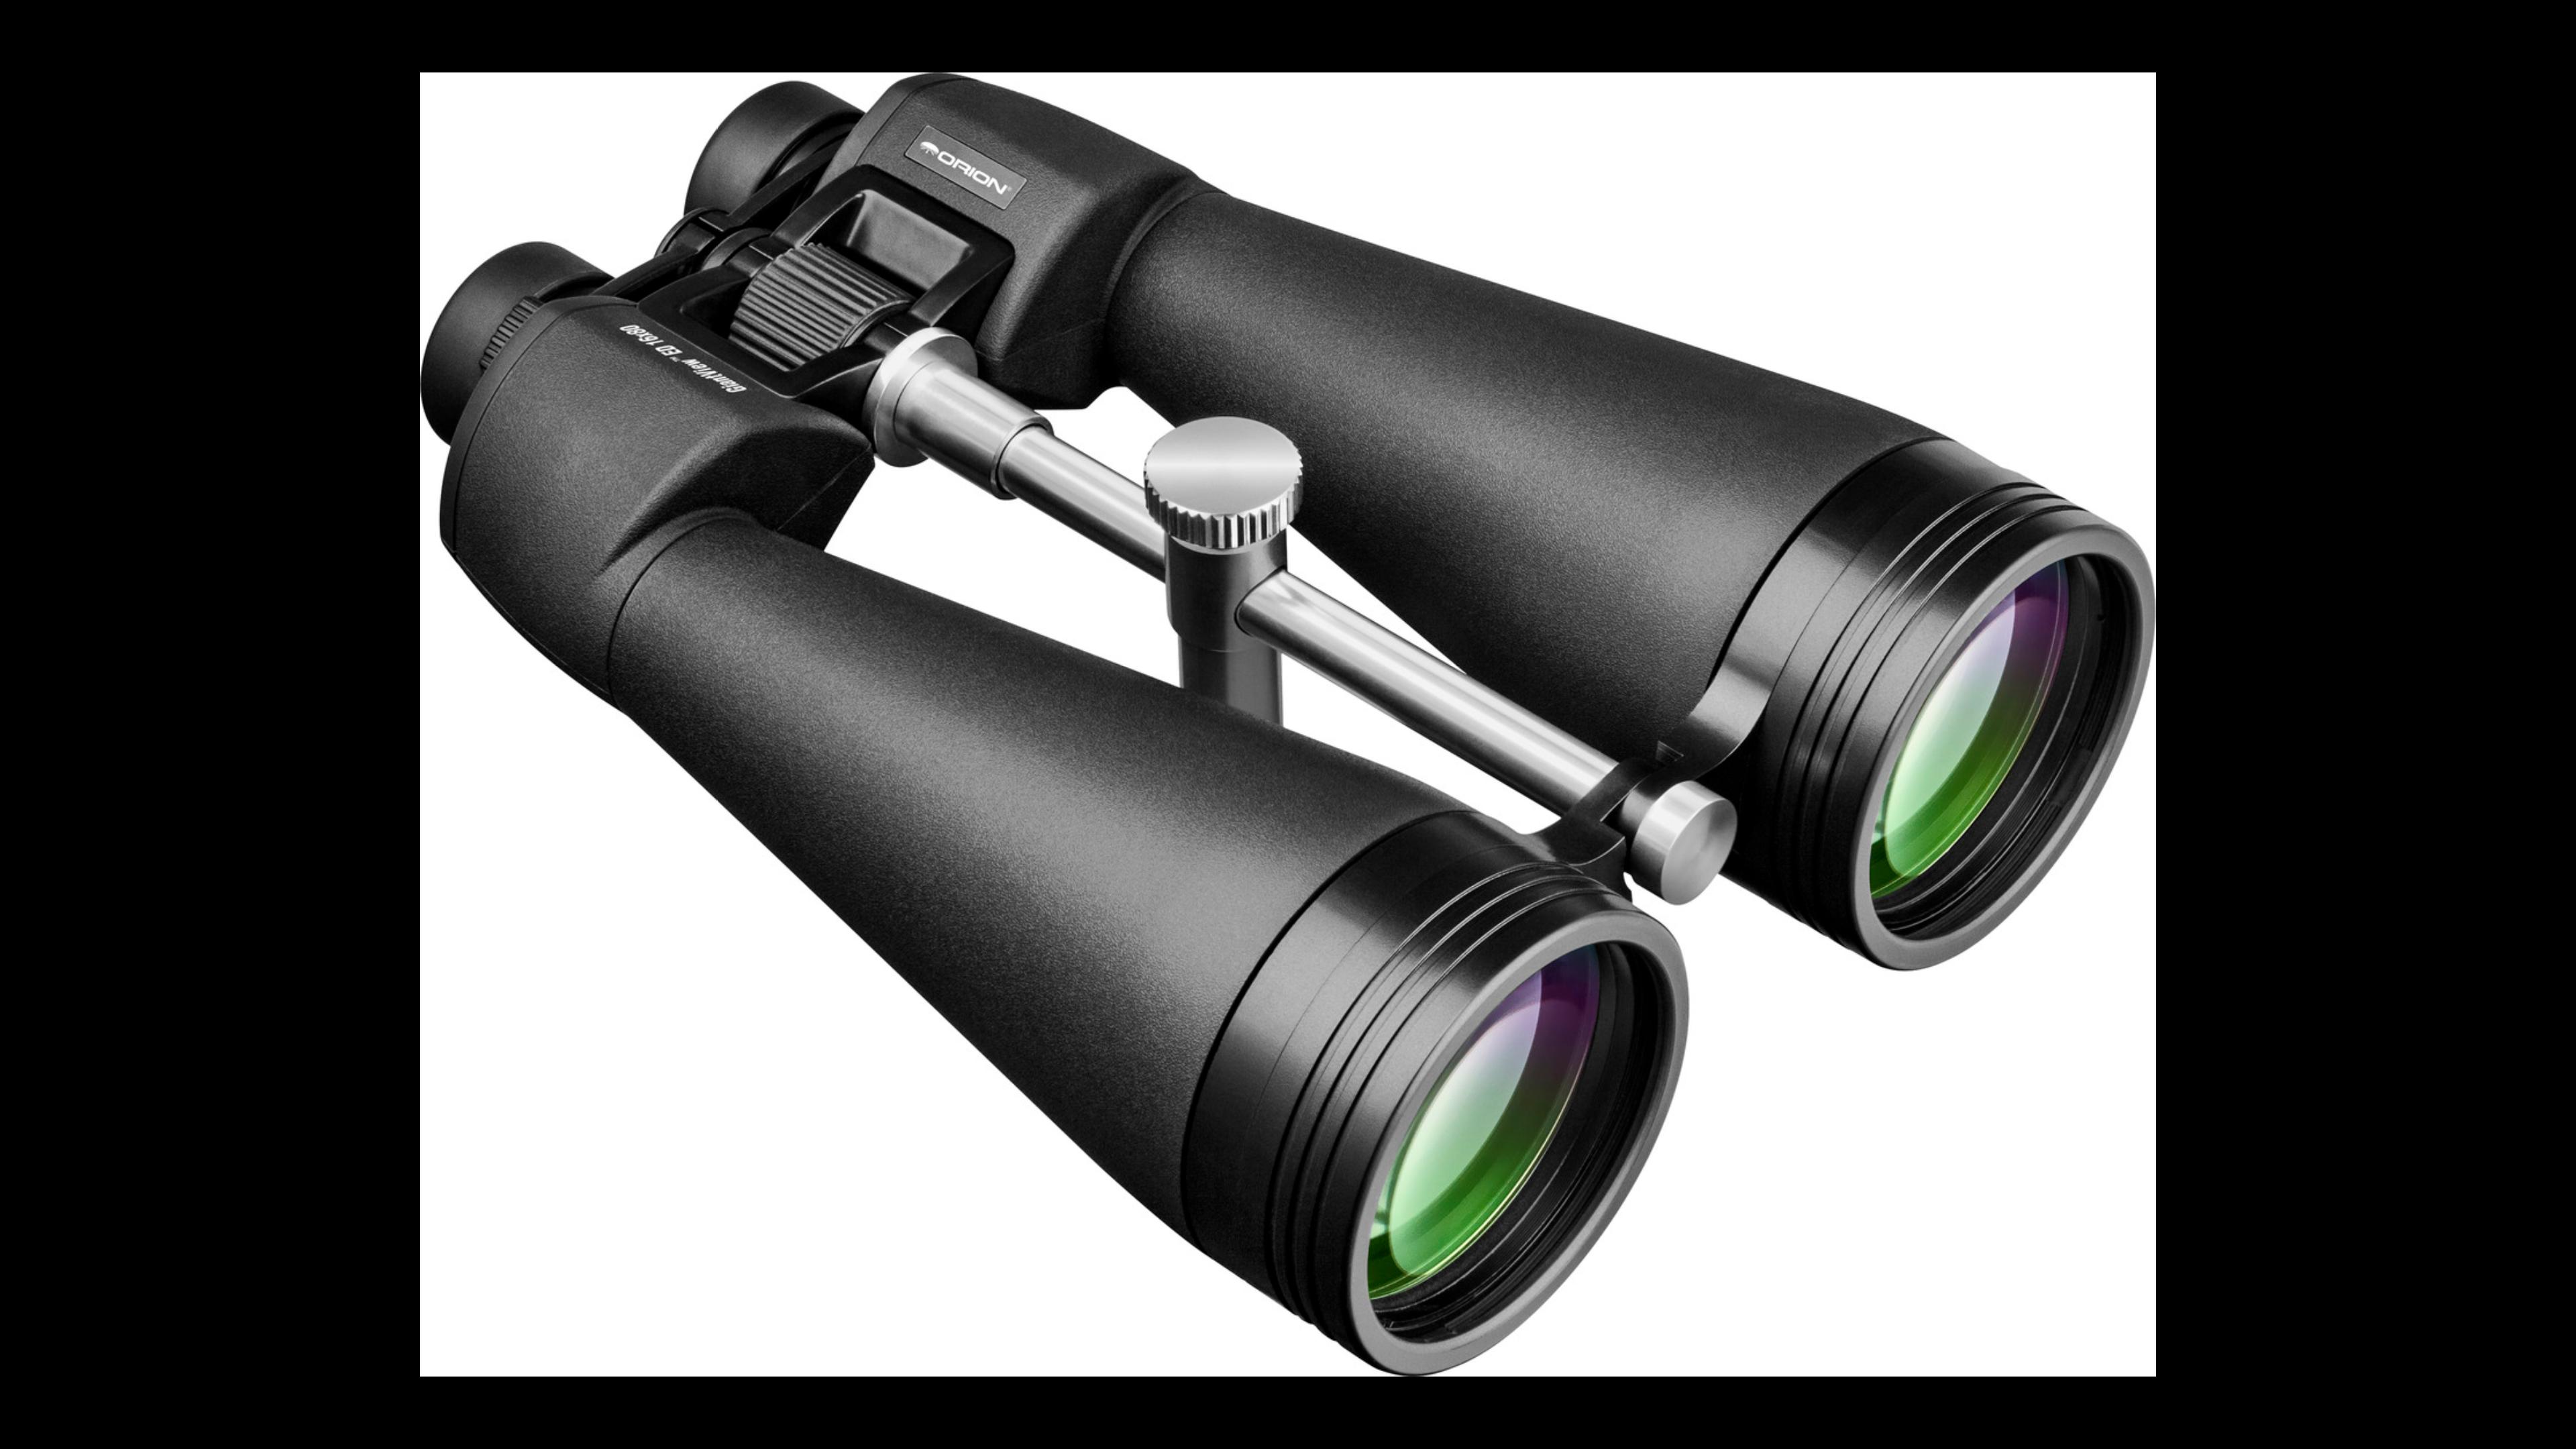 Orion GiantView ED 16x80 Waterproof Astronomy Binoculars